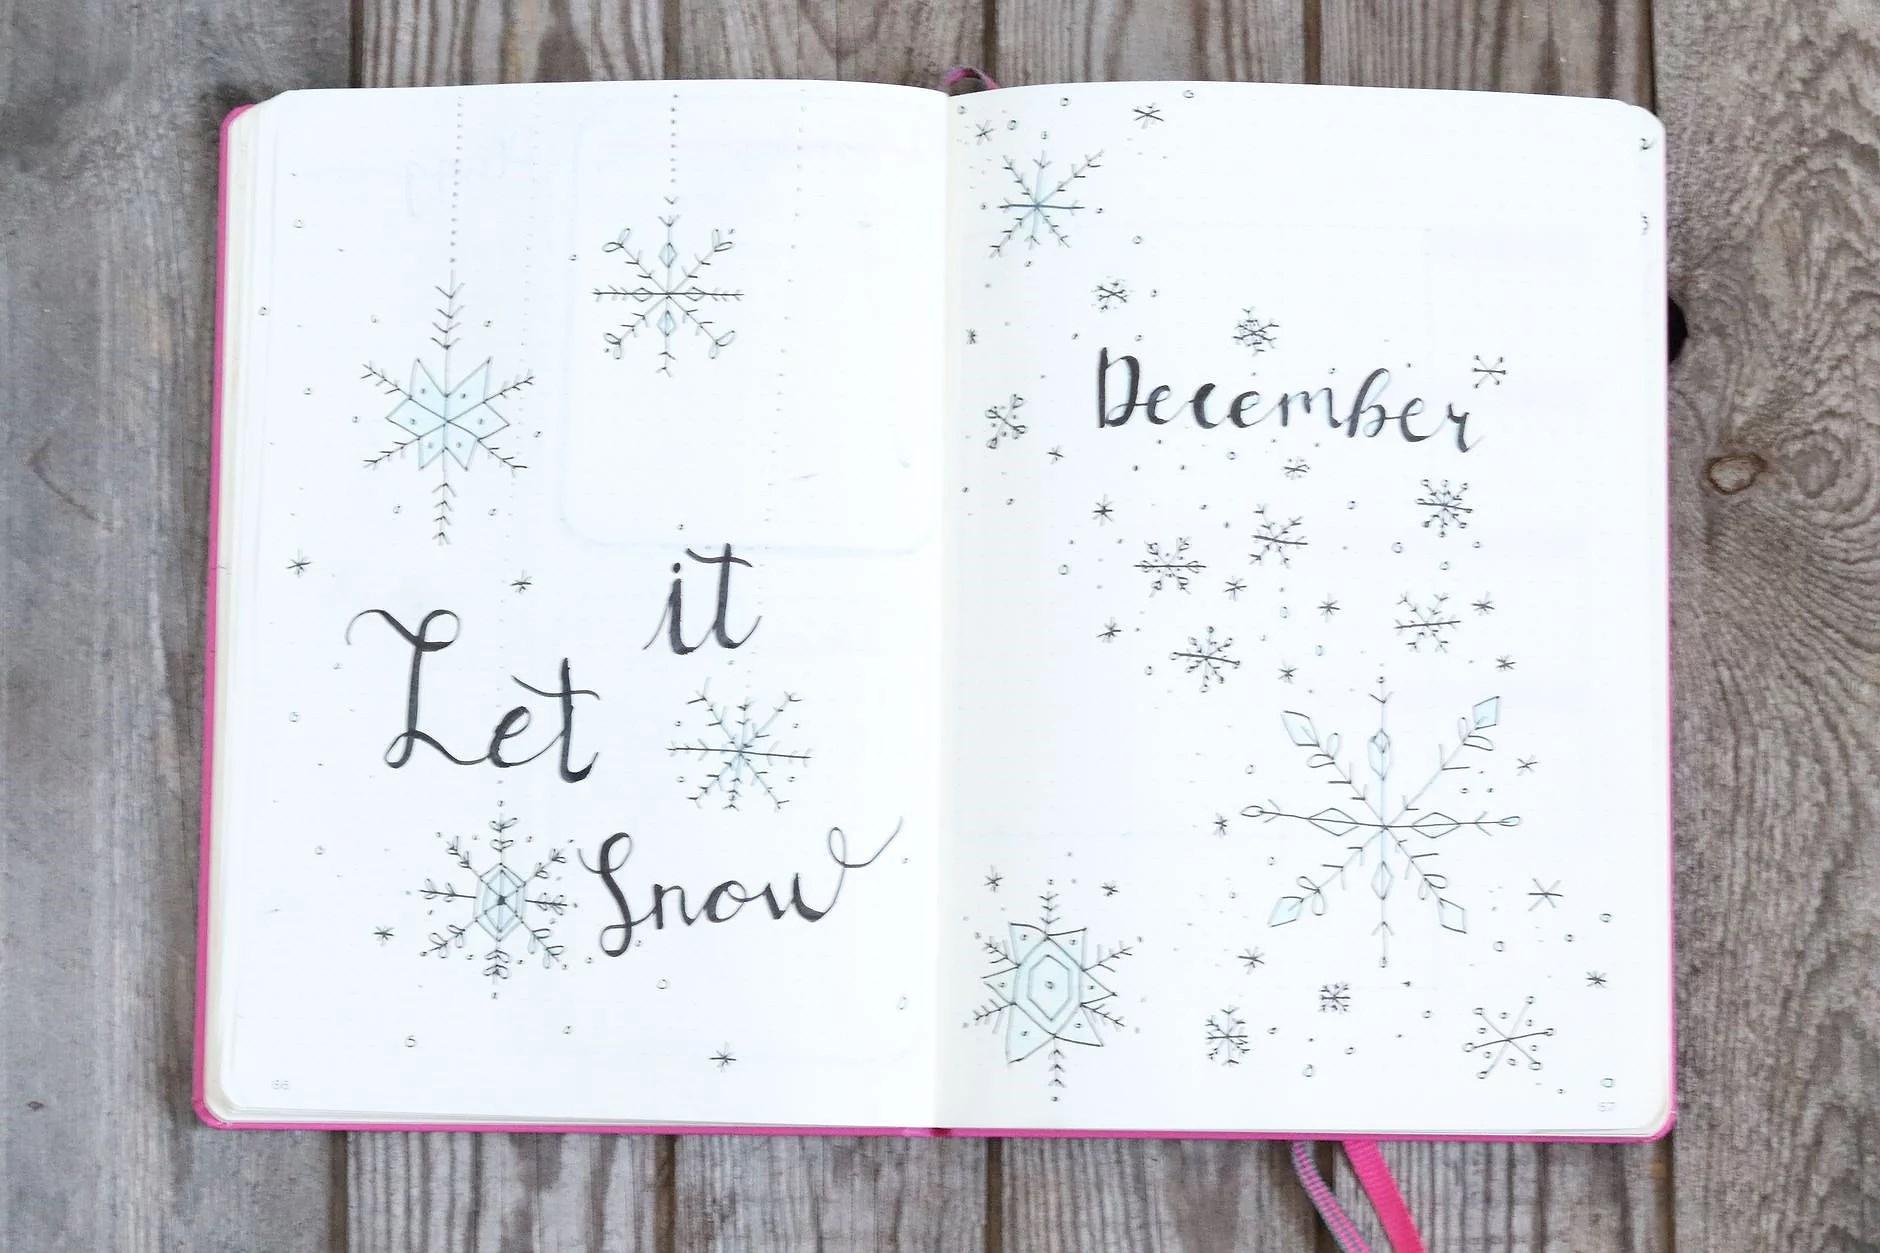 Bullet Journal setup December